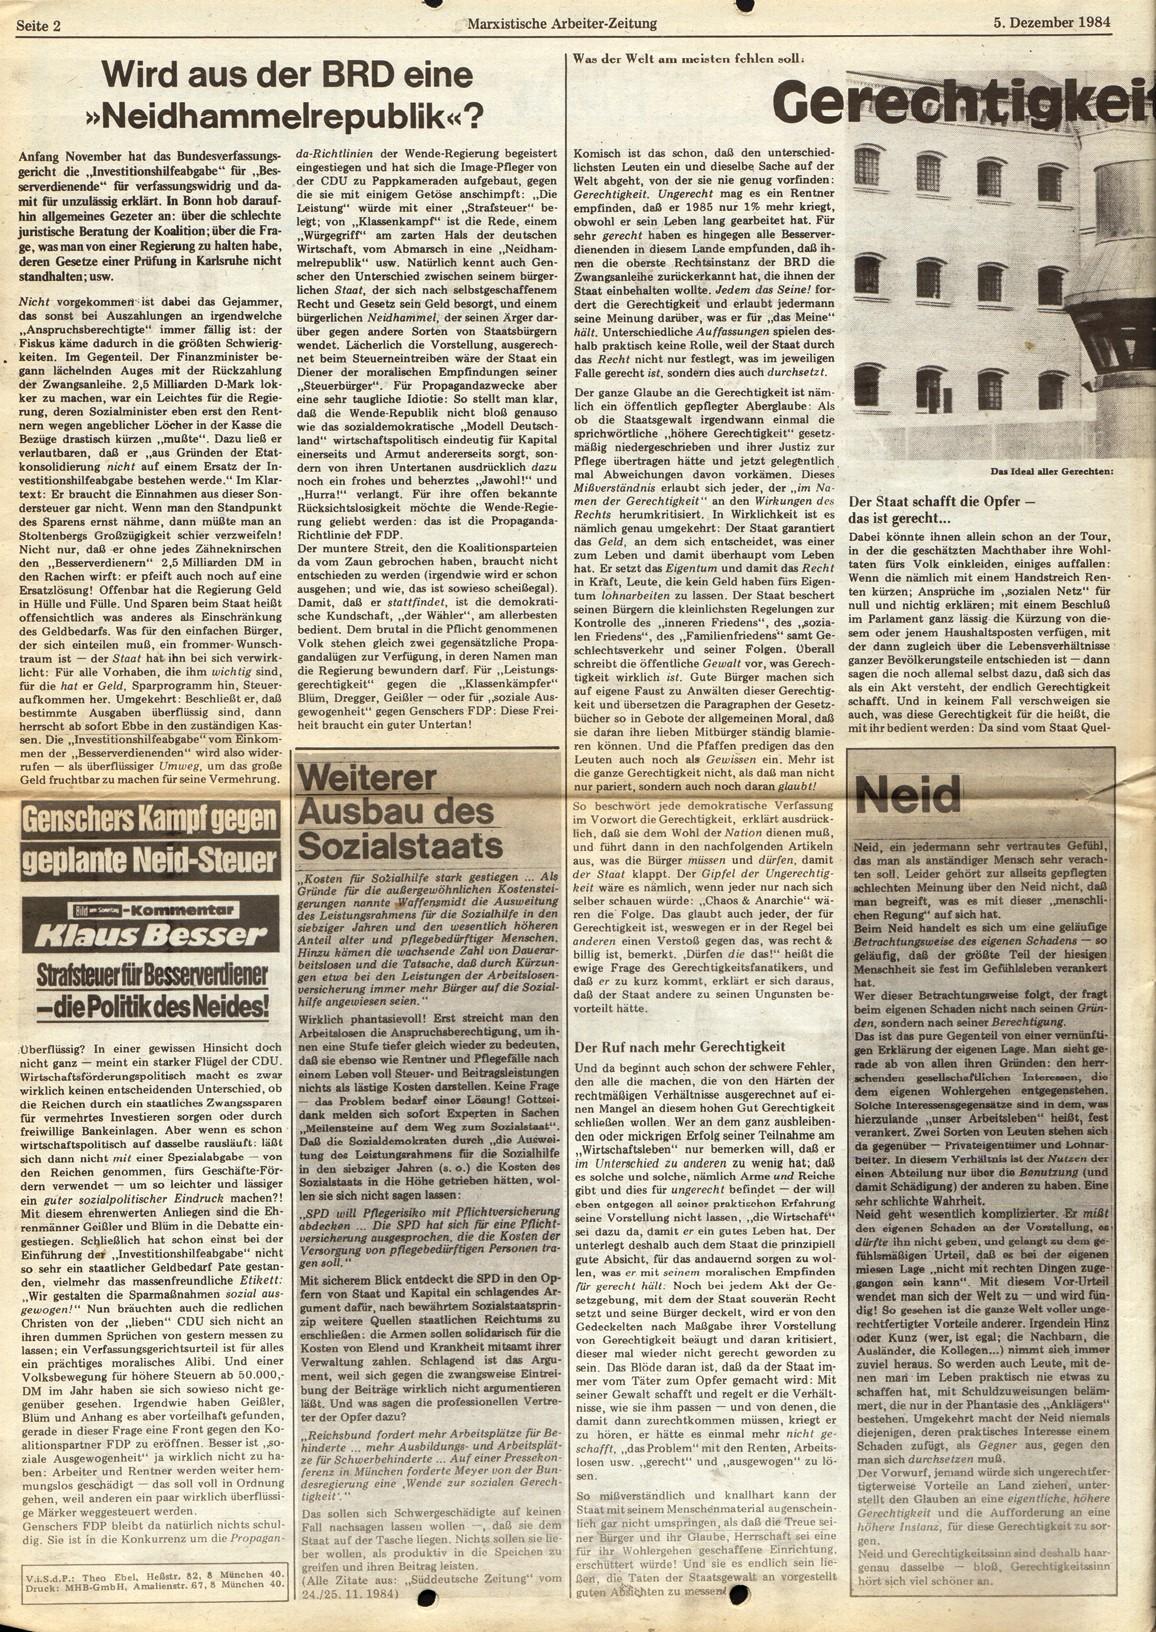 Muenchen_MG_MAZ_BMW_19841205_02